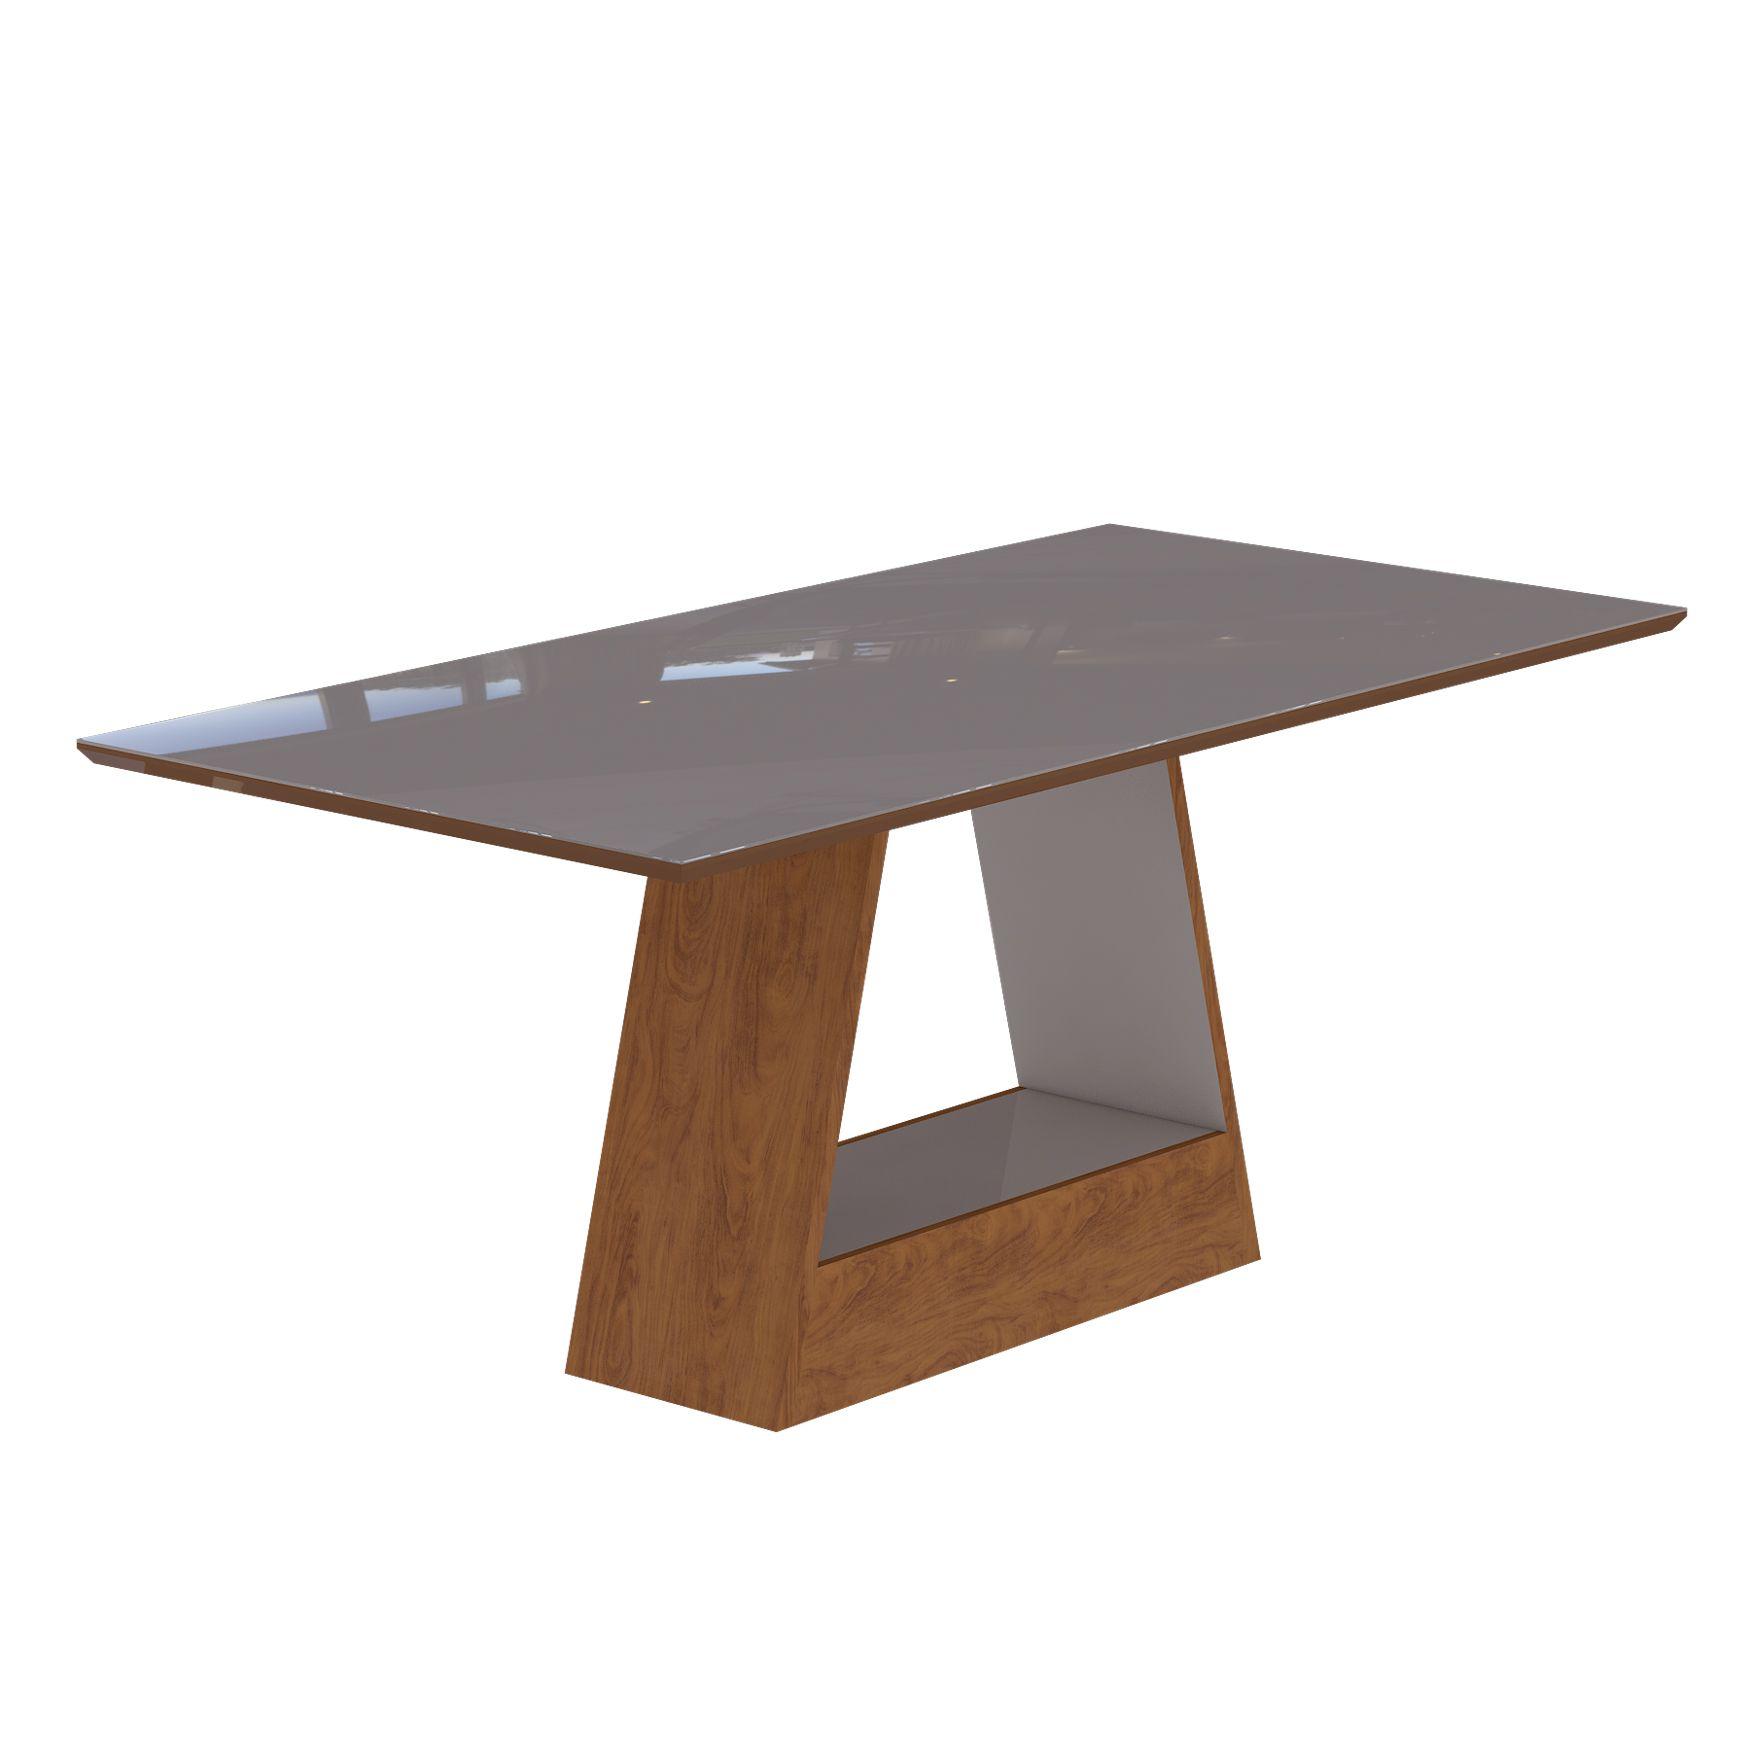 Mesa para Sala de Jantar Alana 180 cm e 6 Cadeiras Paola Cimol Savana/Off White/Madeira/Nude